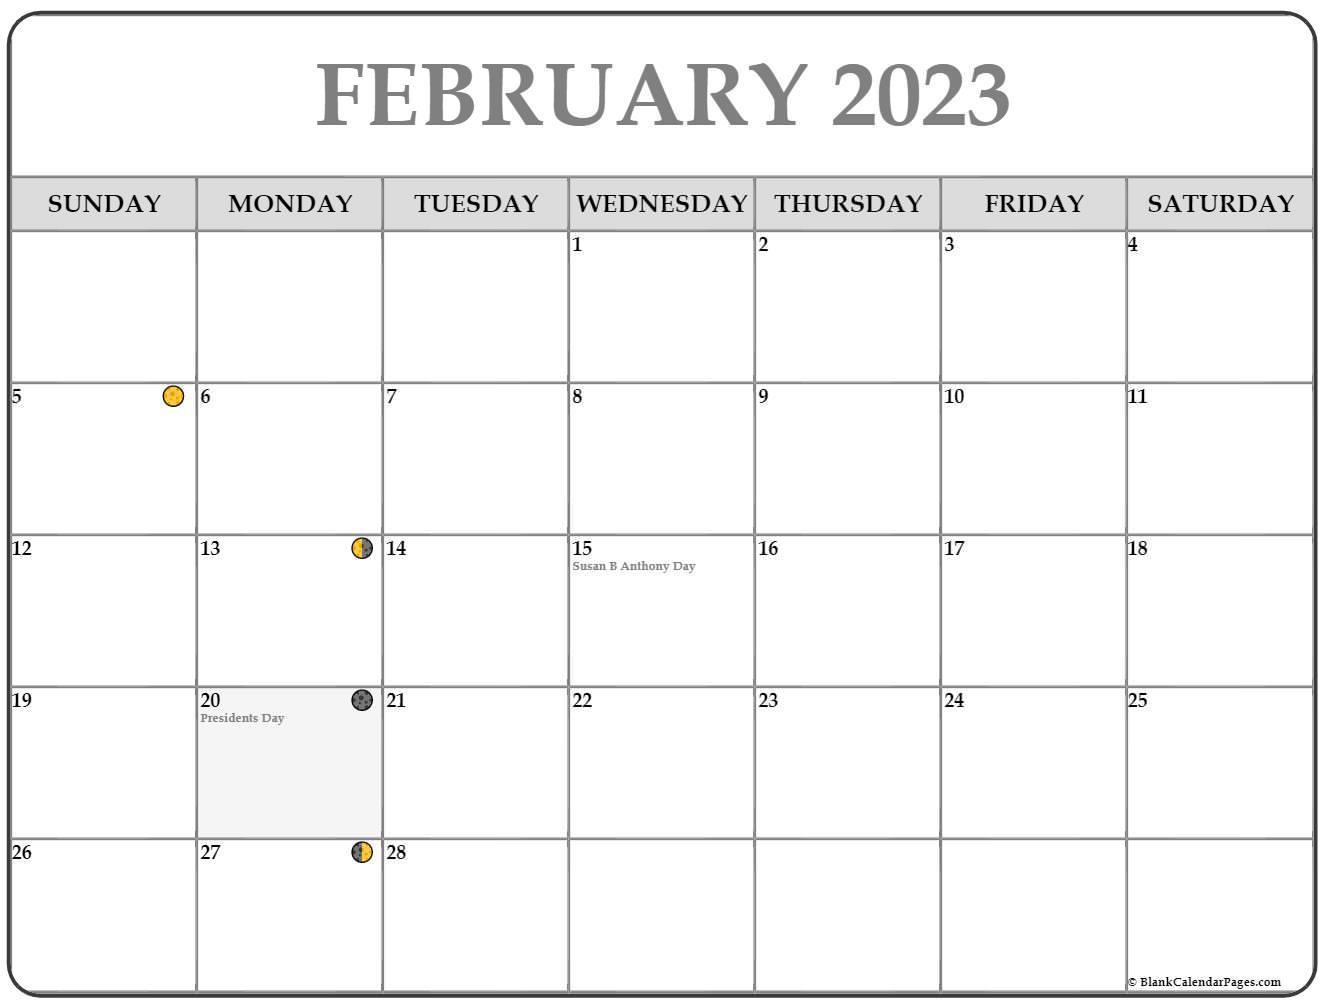 February 2022 Lunar Calendar | Moon Phase Calendar